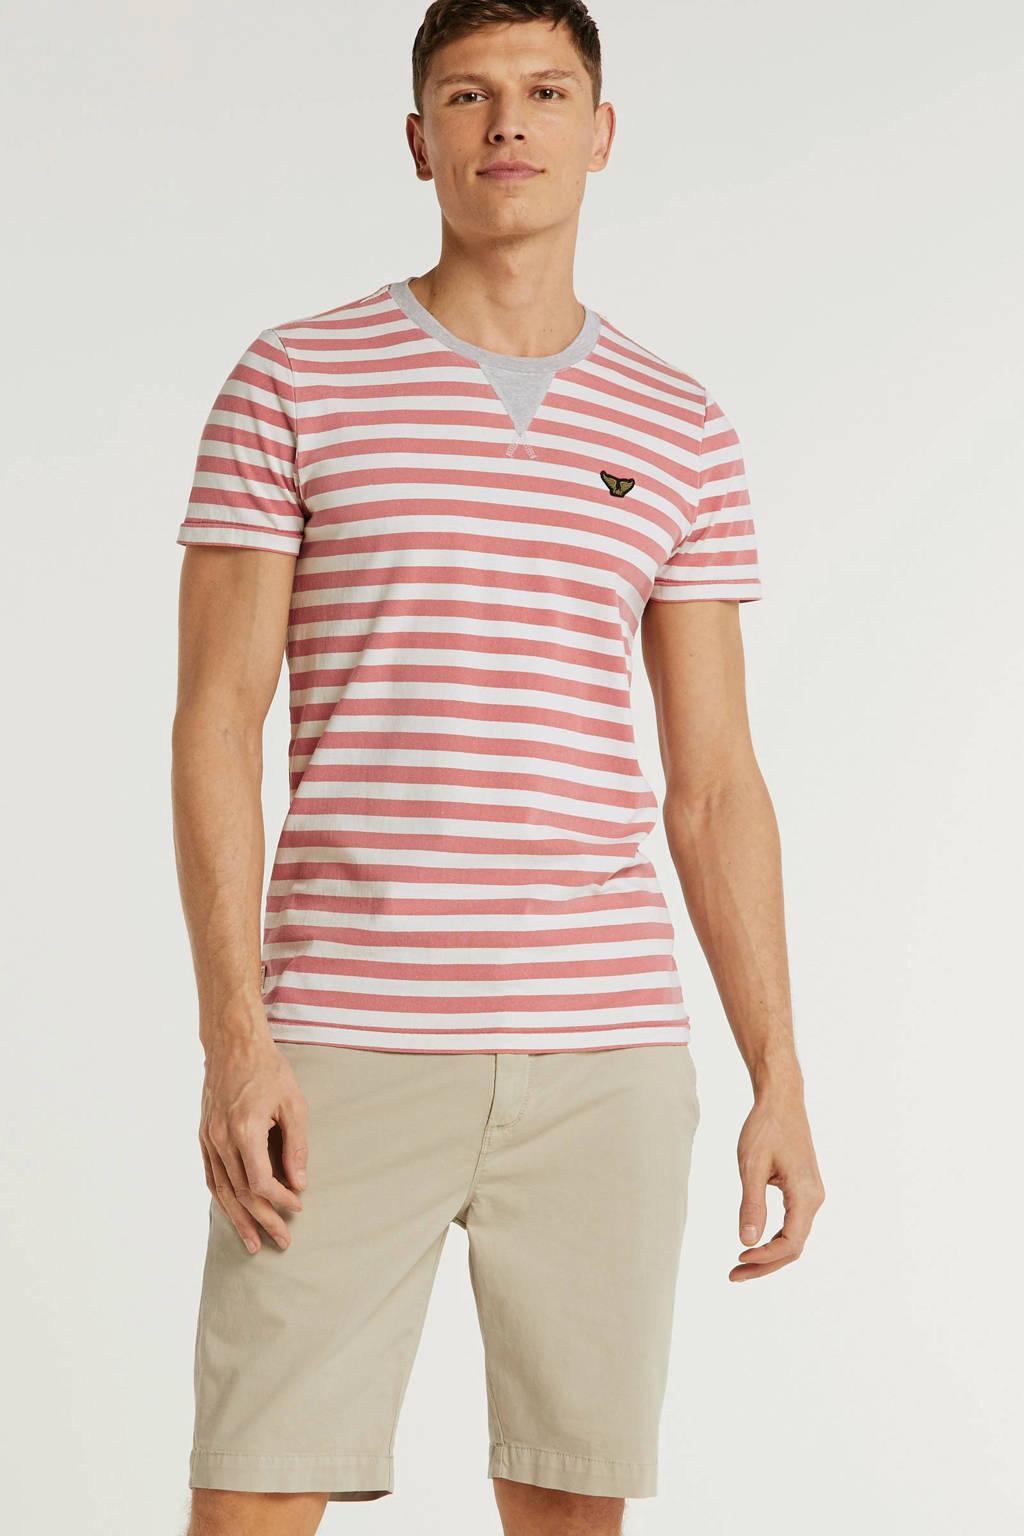 PME Legend gestreept T-shirt rood, Rood